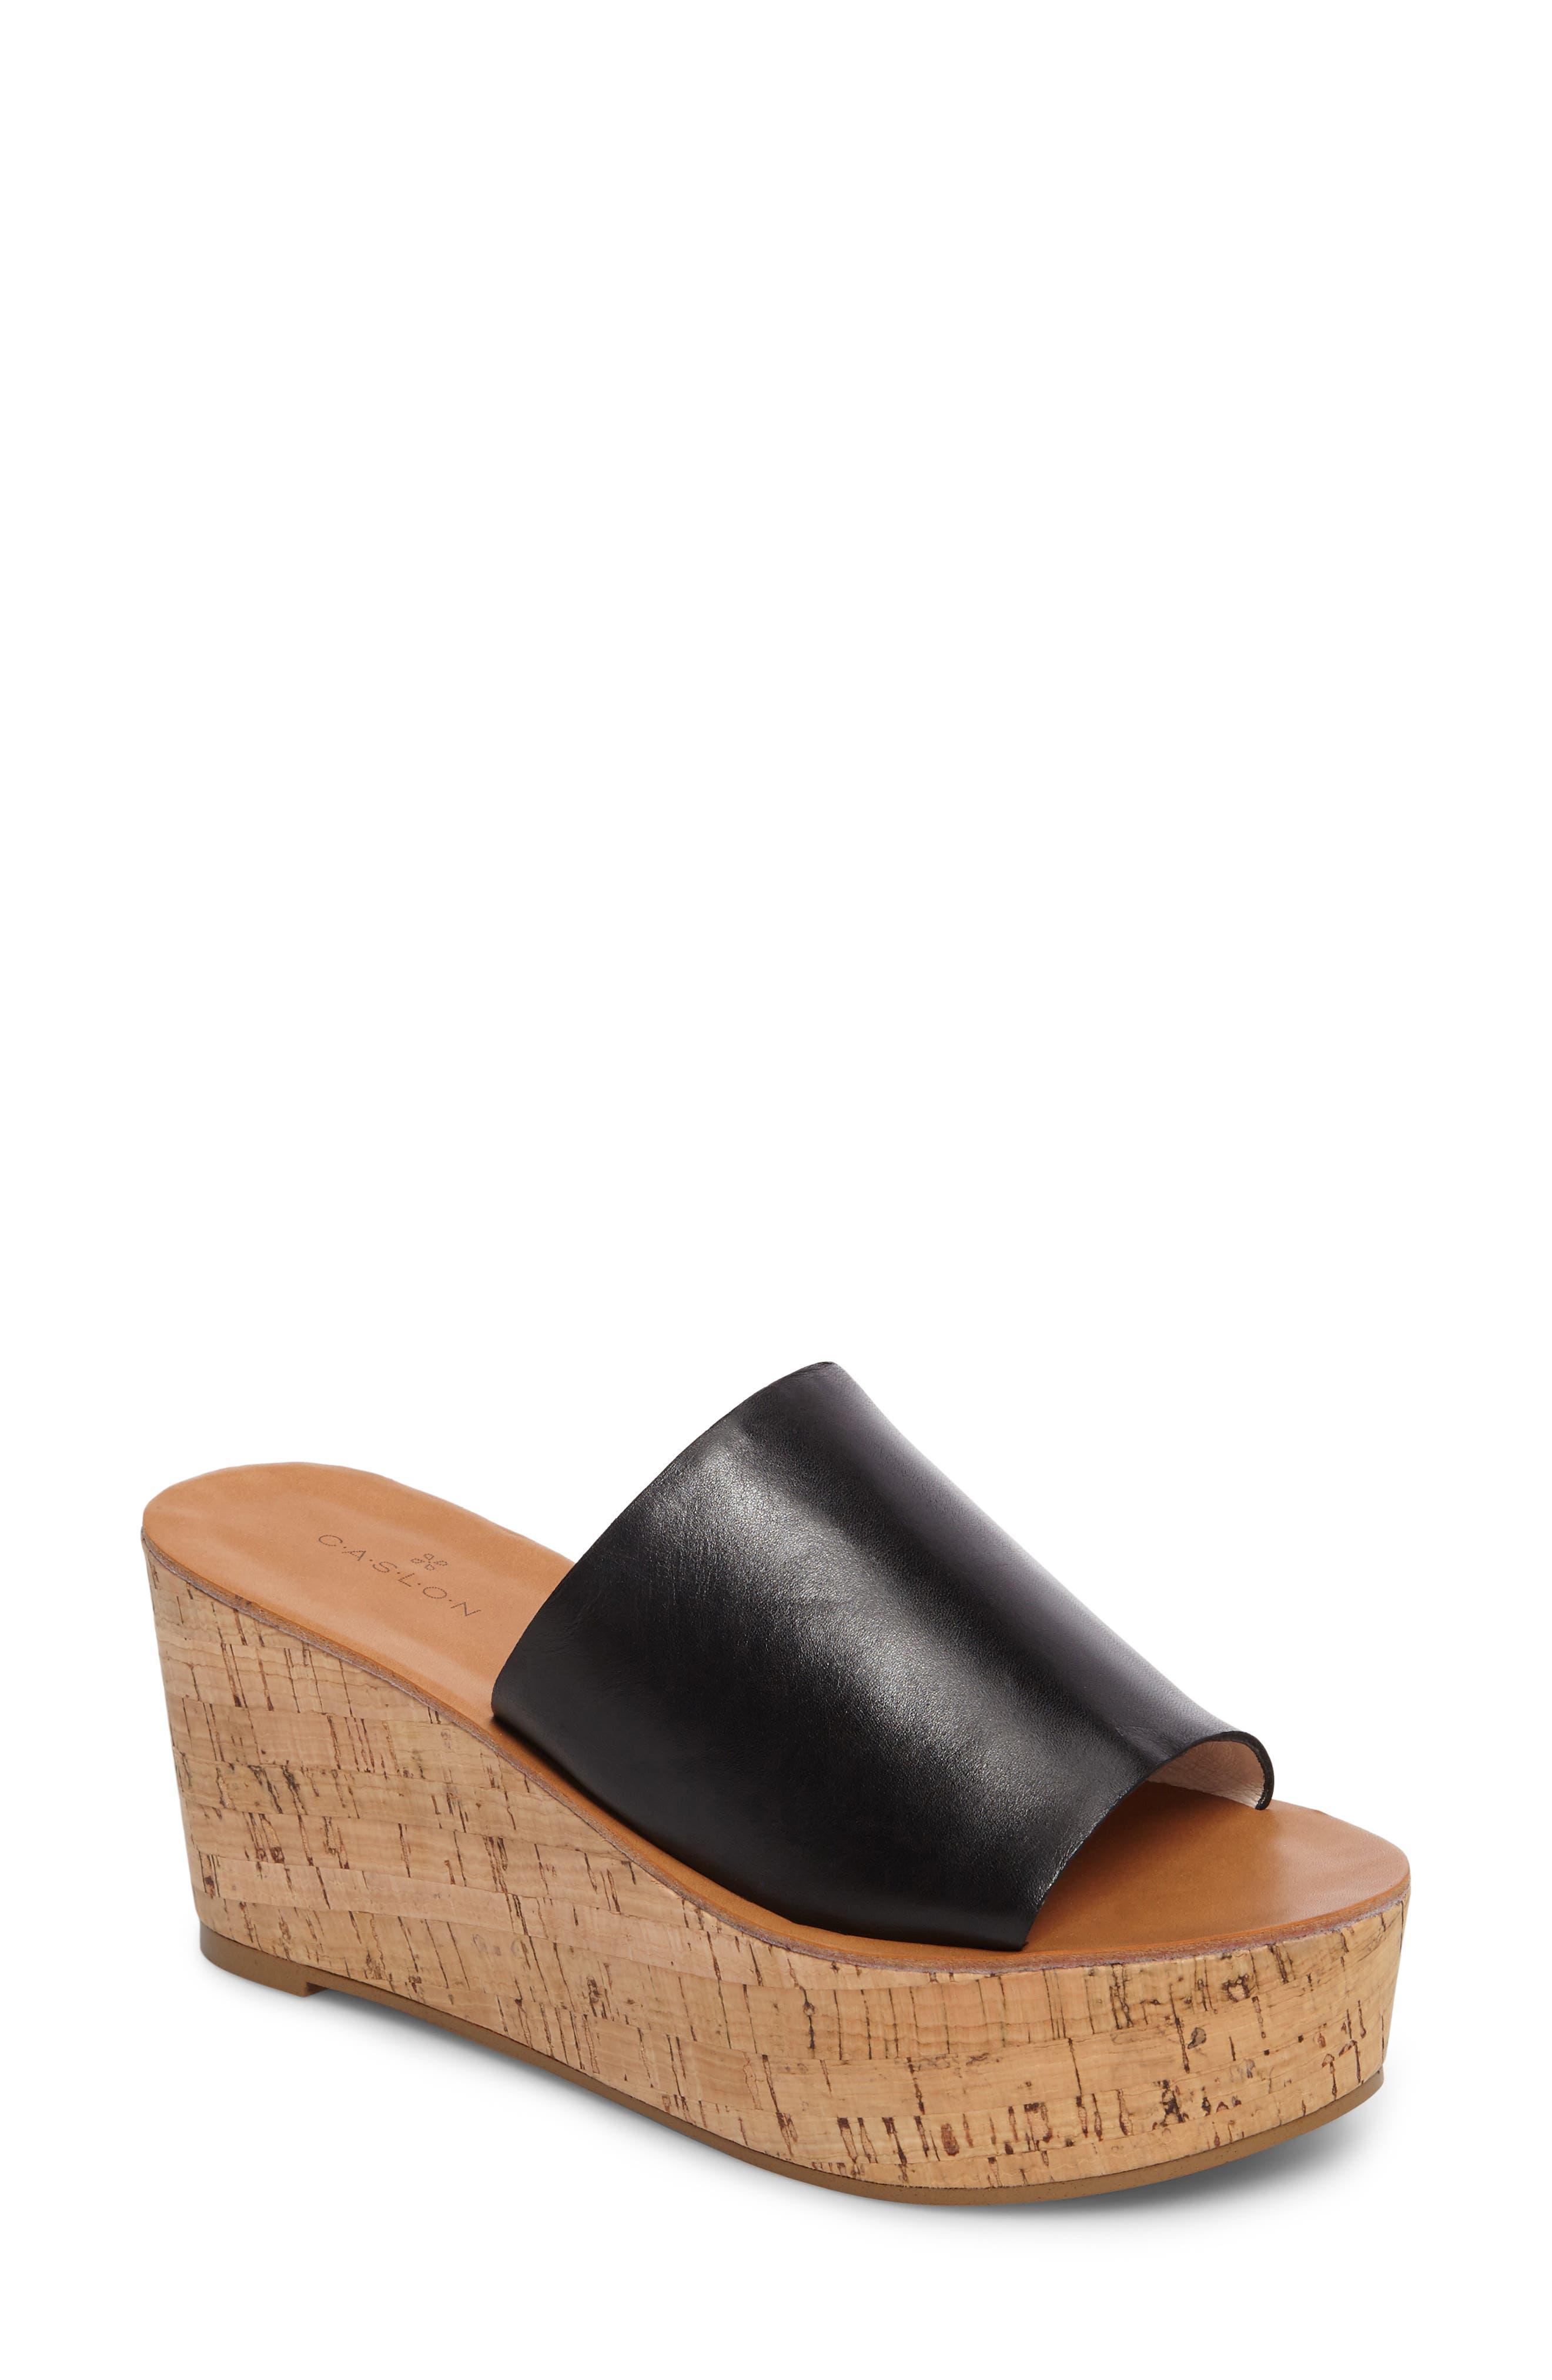 Alternate Image 1 Selected - Caslon® Hailey Platform Sandal (Women)